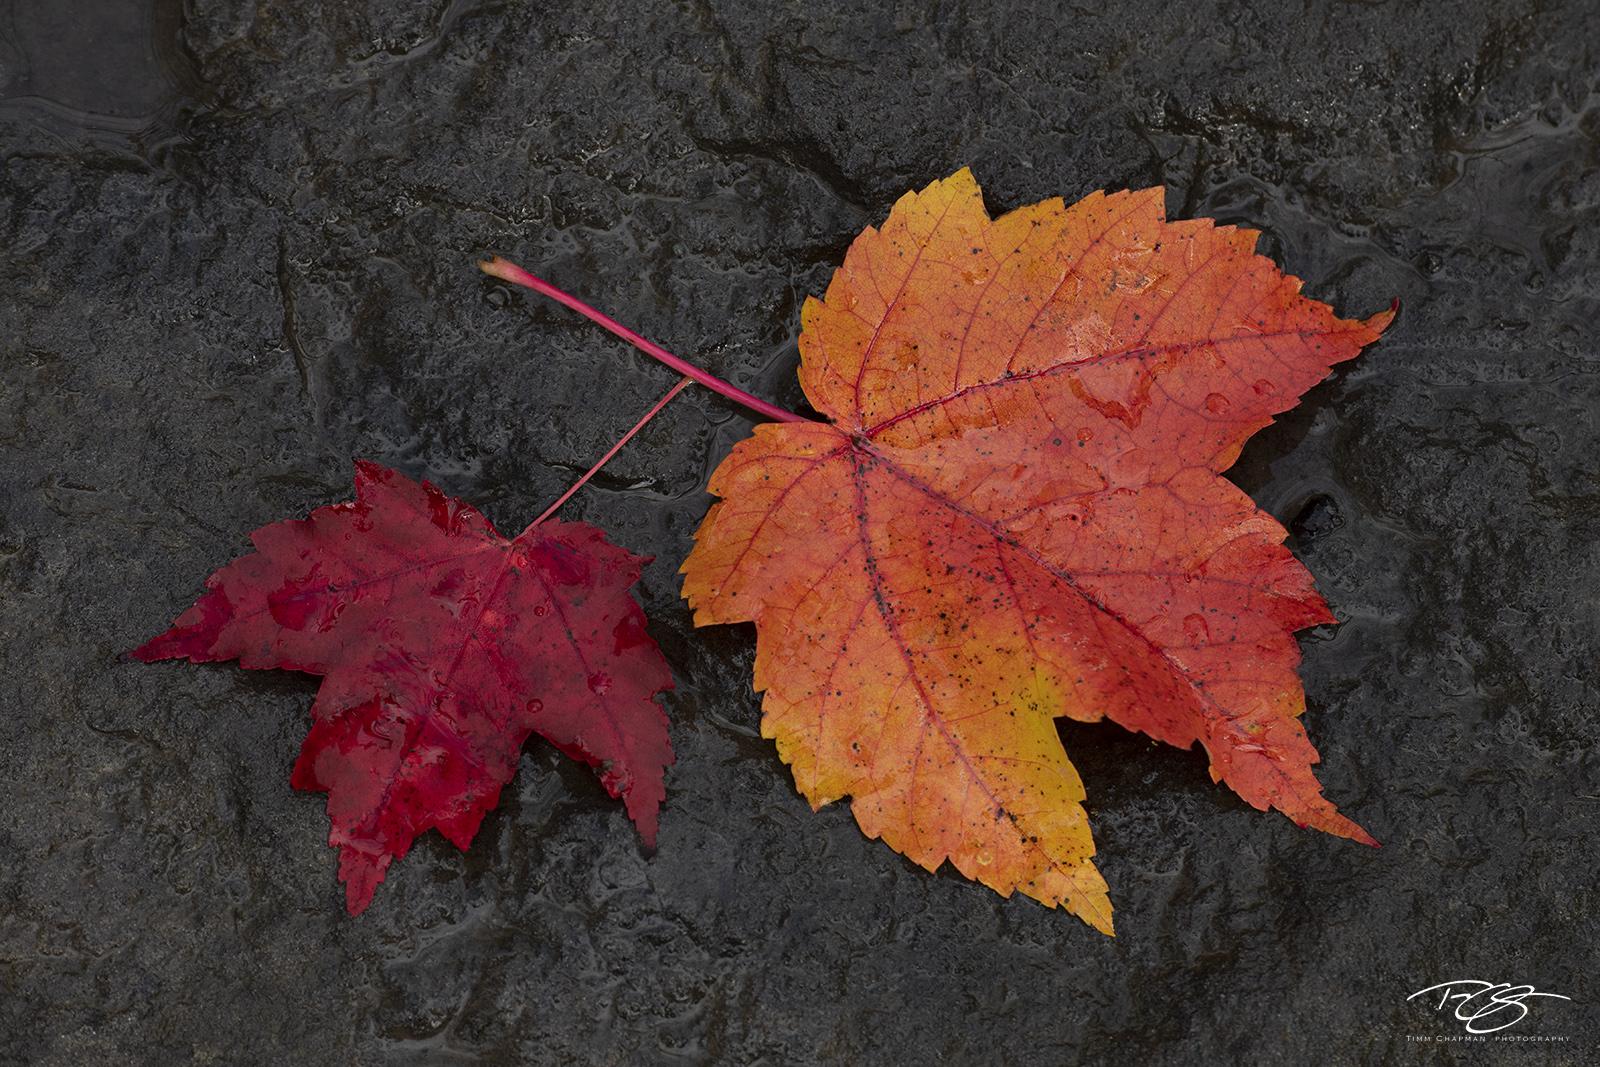 autumn, fall, colour, colours, color, colors, leaves, new england, baxter state park, maine, maple, sugar maple, leaf, red, orange, black rock, wet, photo